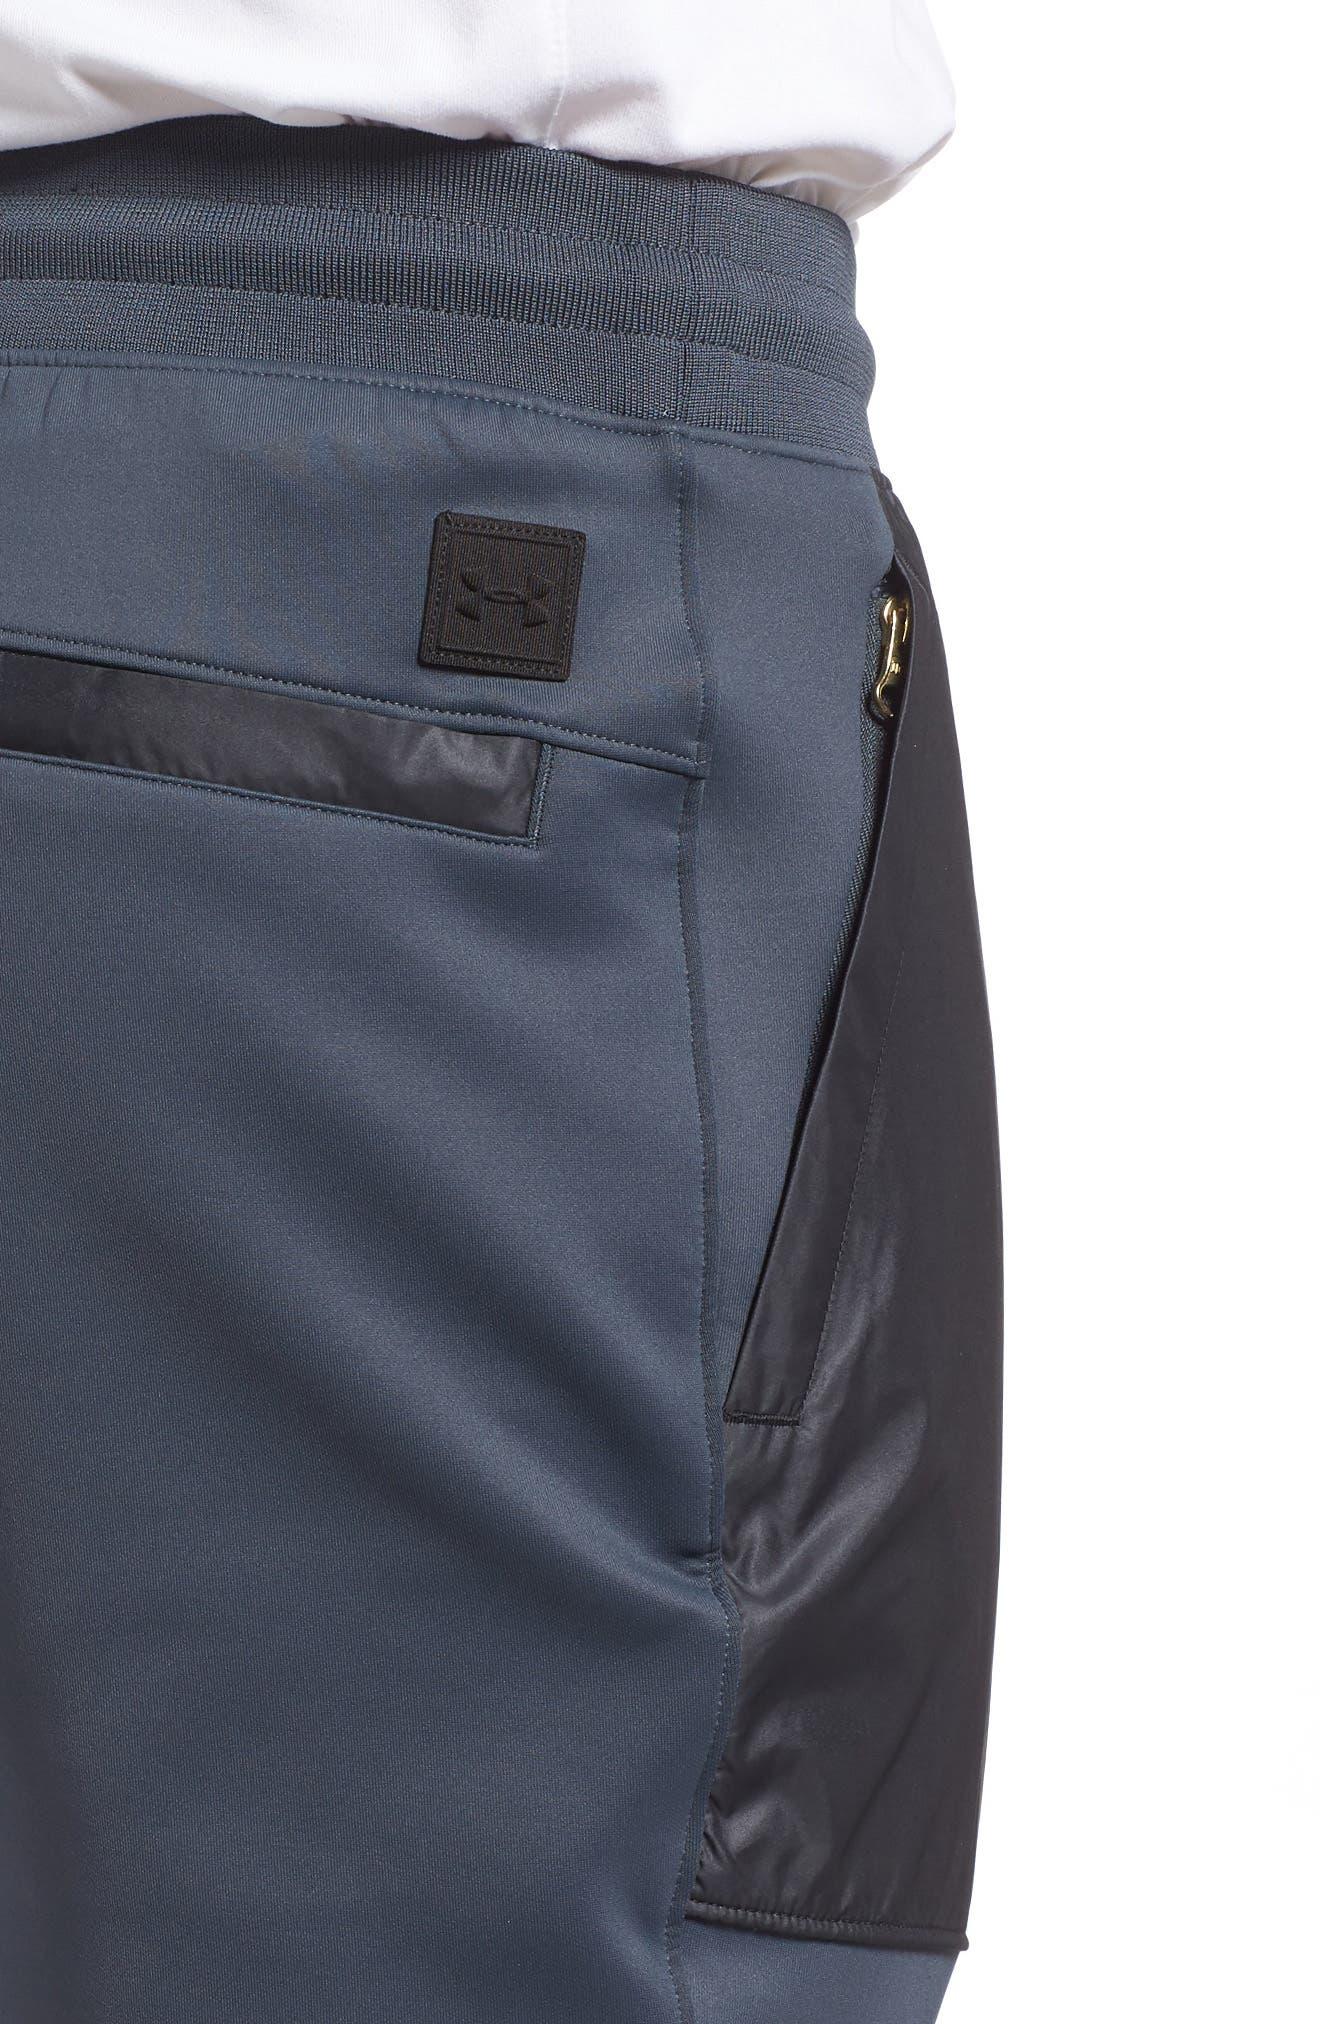 Utility Jogger Pants,                             Alternate thumbnail 4, color,                             Stealth Gray/ Black